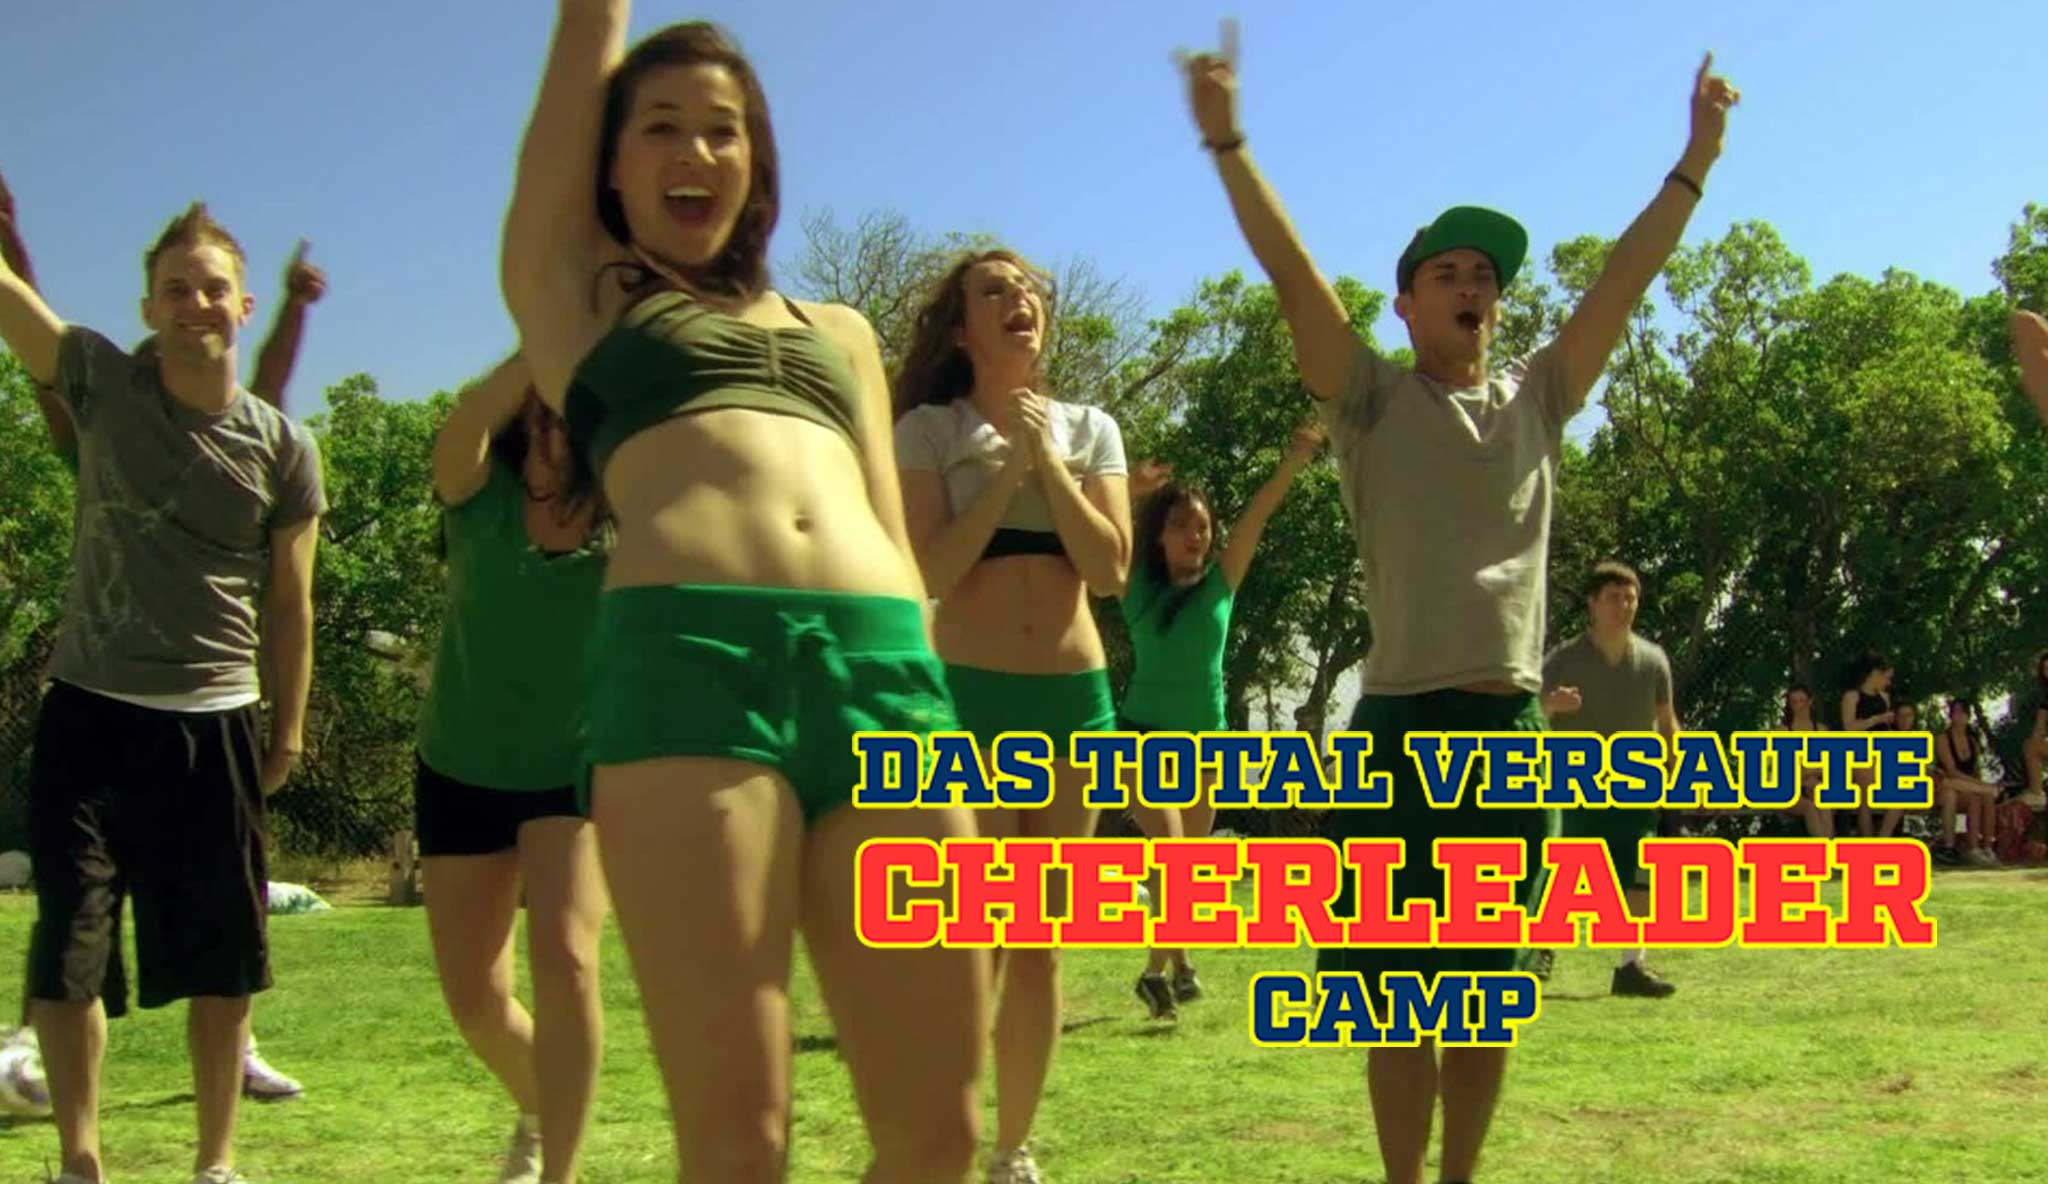 das-total-versaute-cheerleader-camp\header.jpg